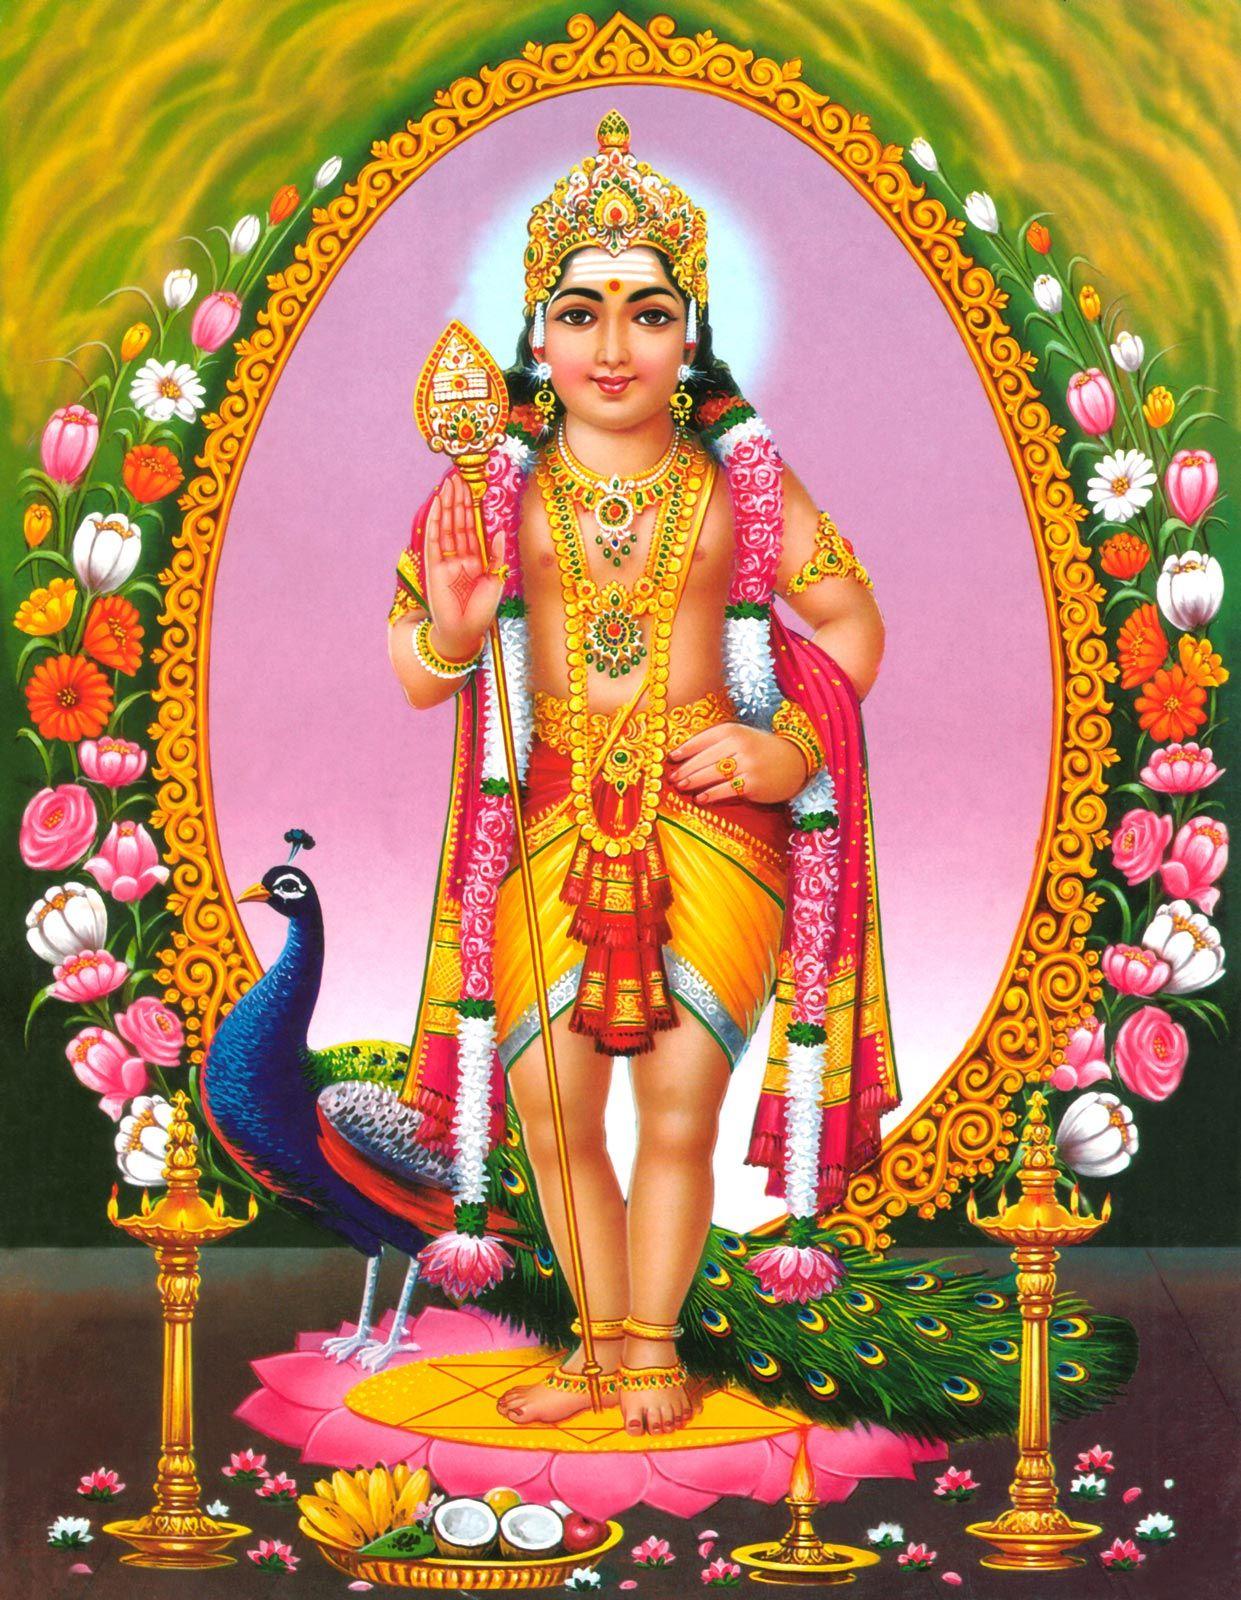 God Murugan Latest Hd Photos Wallpapers 1080p 482 Murugan Godmurugan Hindugod Lord Murugan Lord Murugan Wallpapers Lord Shiva Family